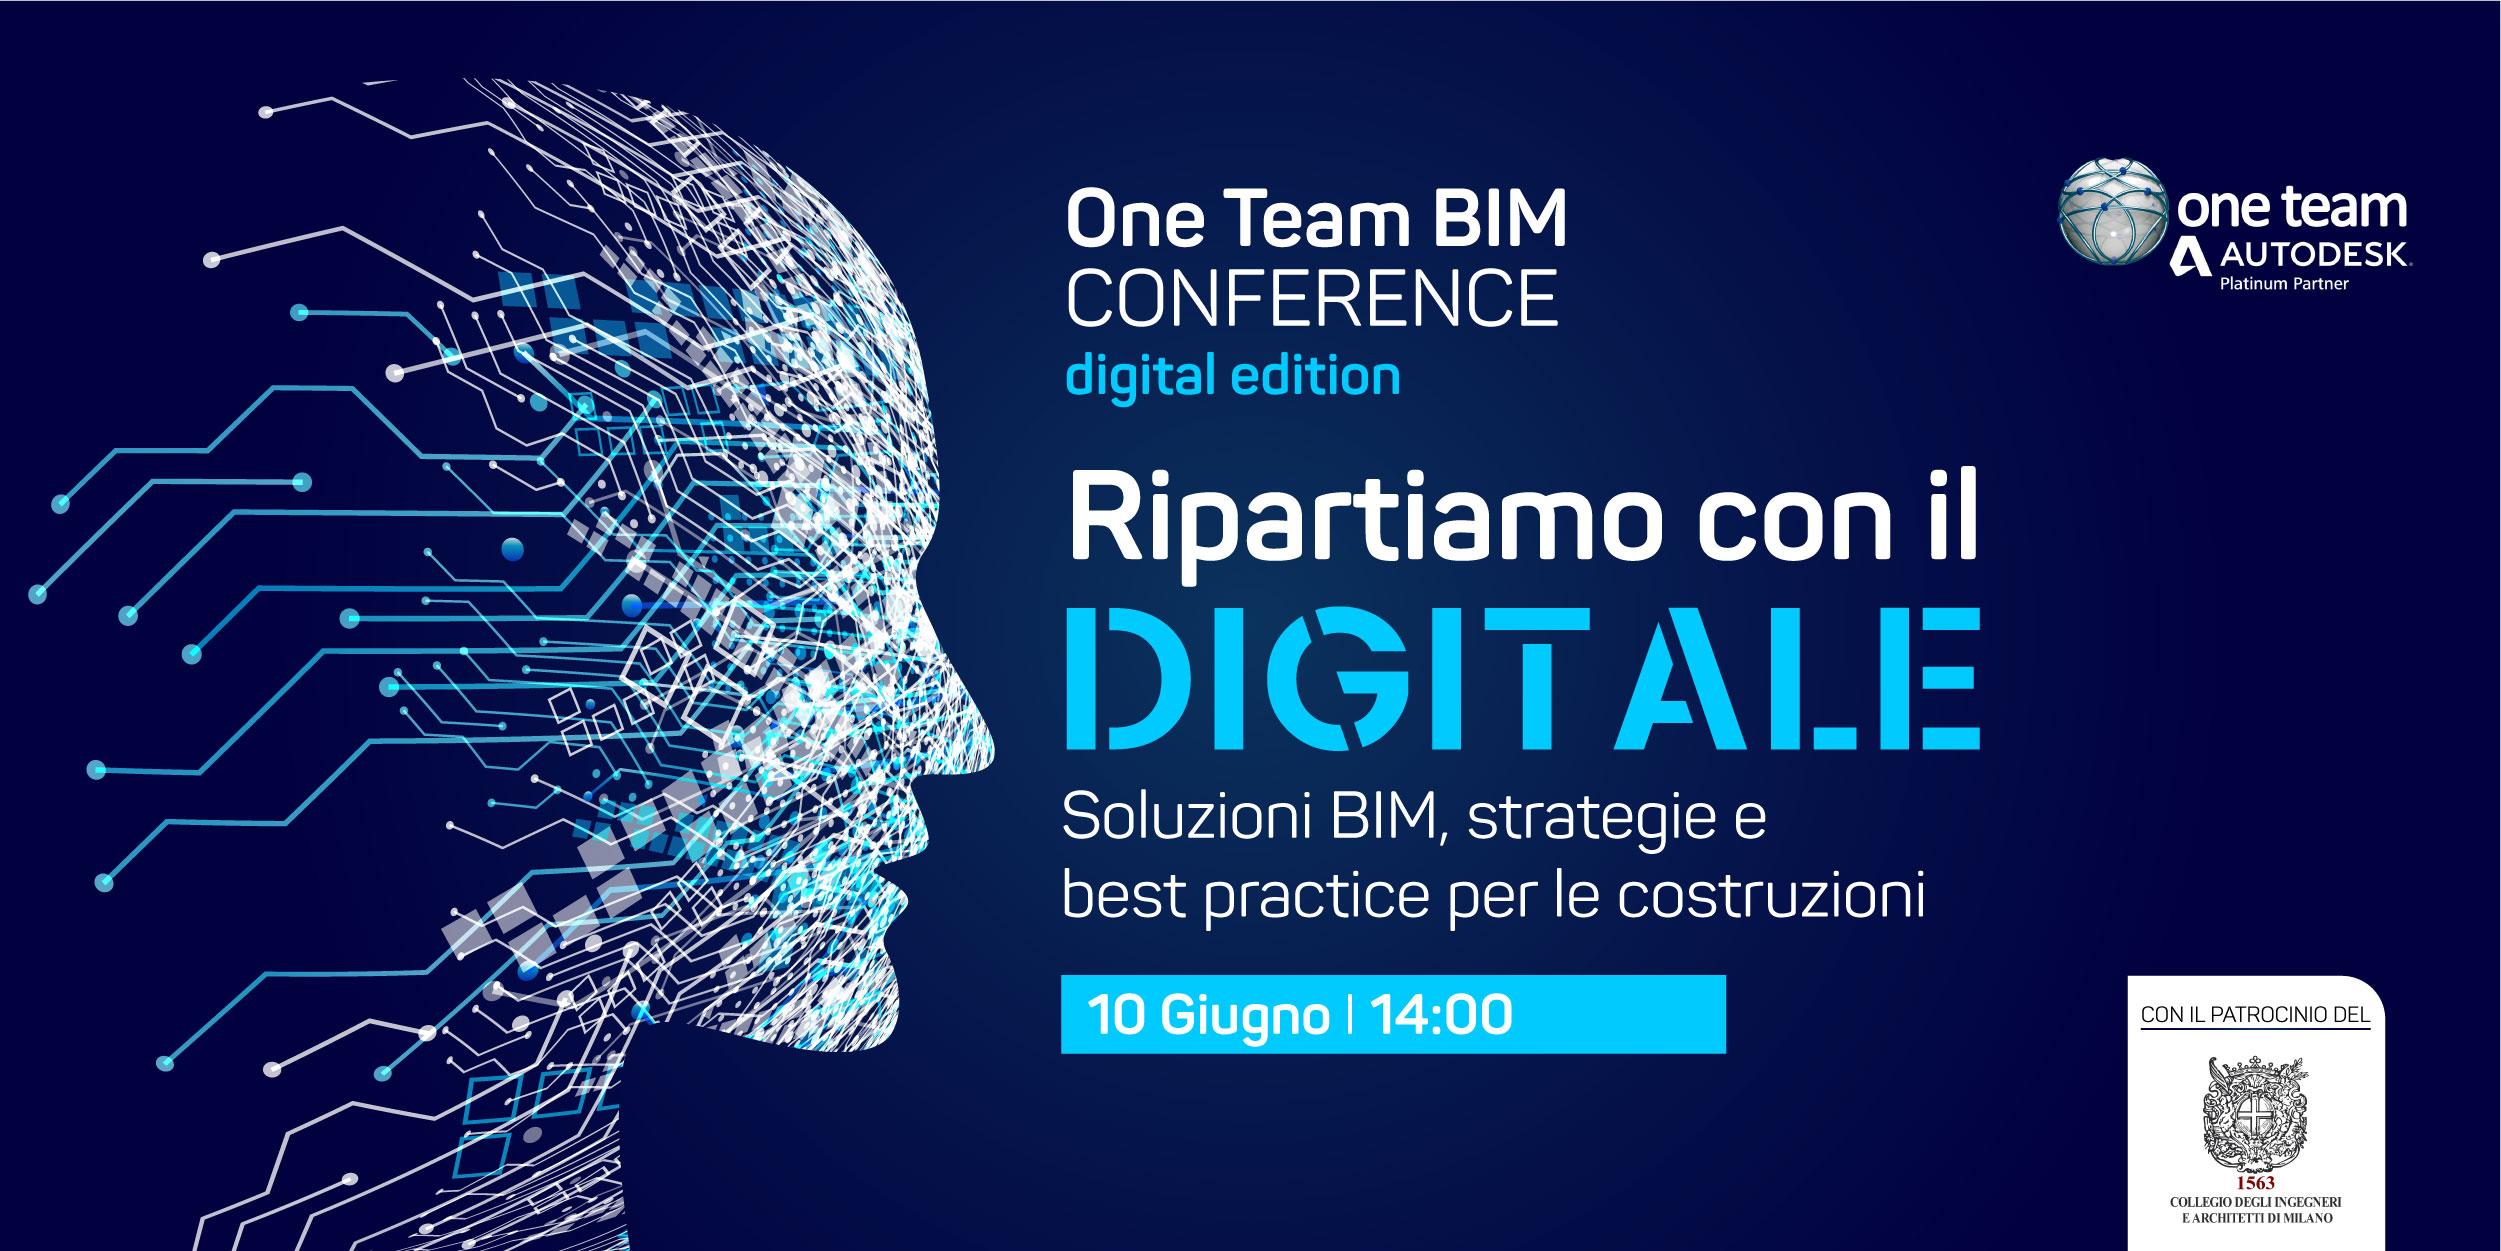 one team bim conference